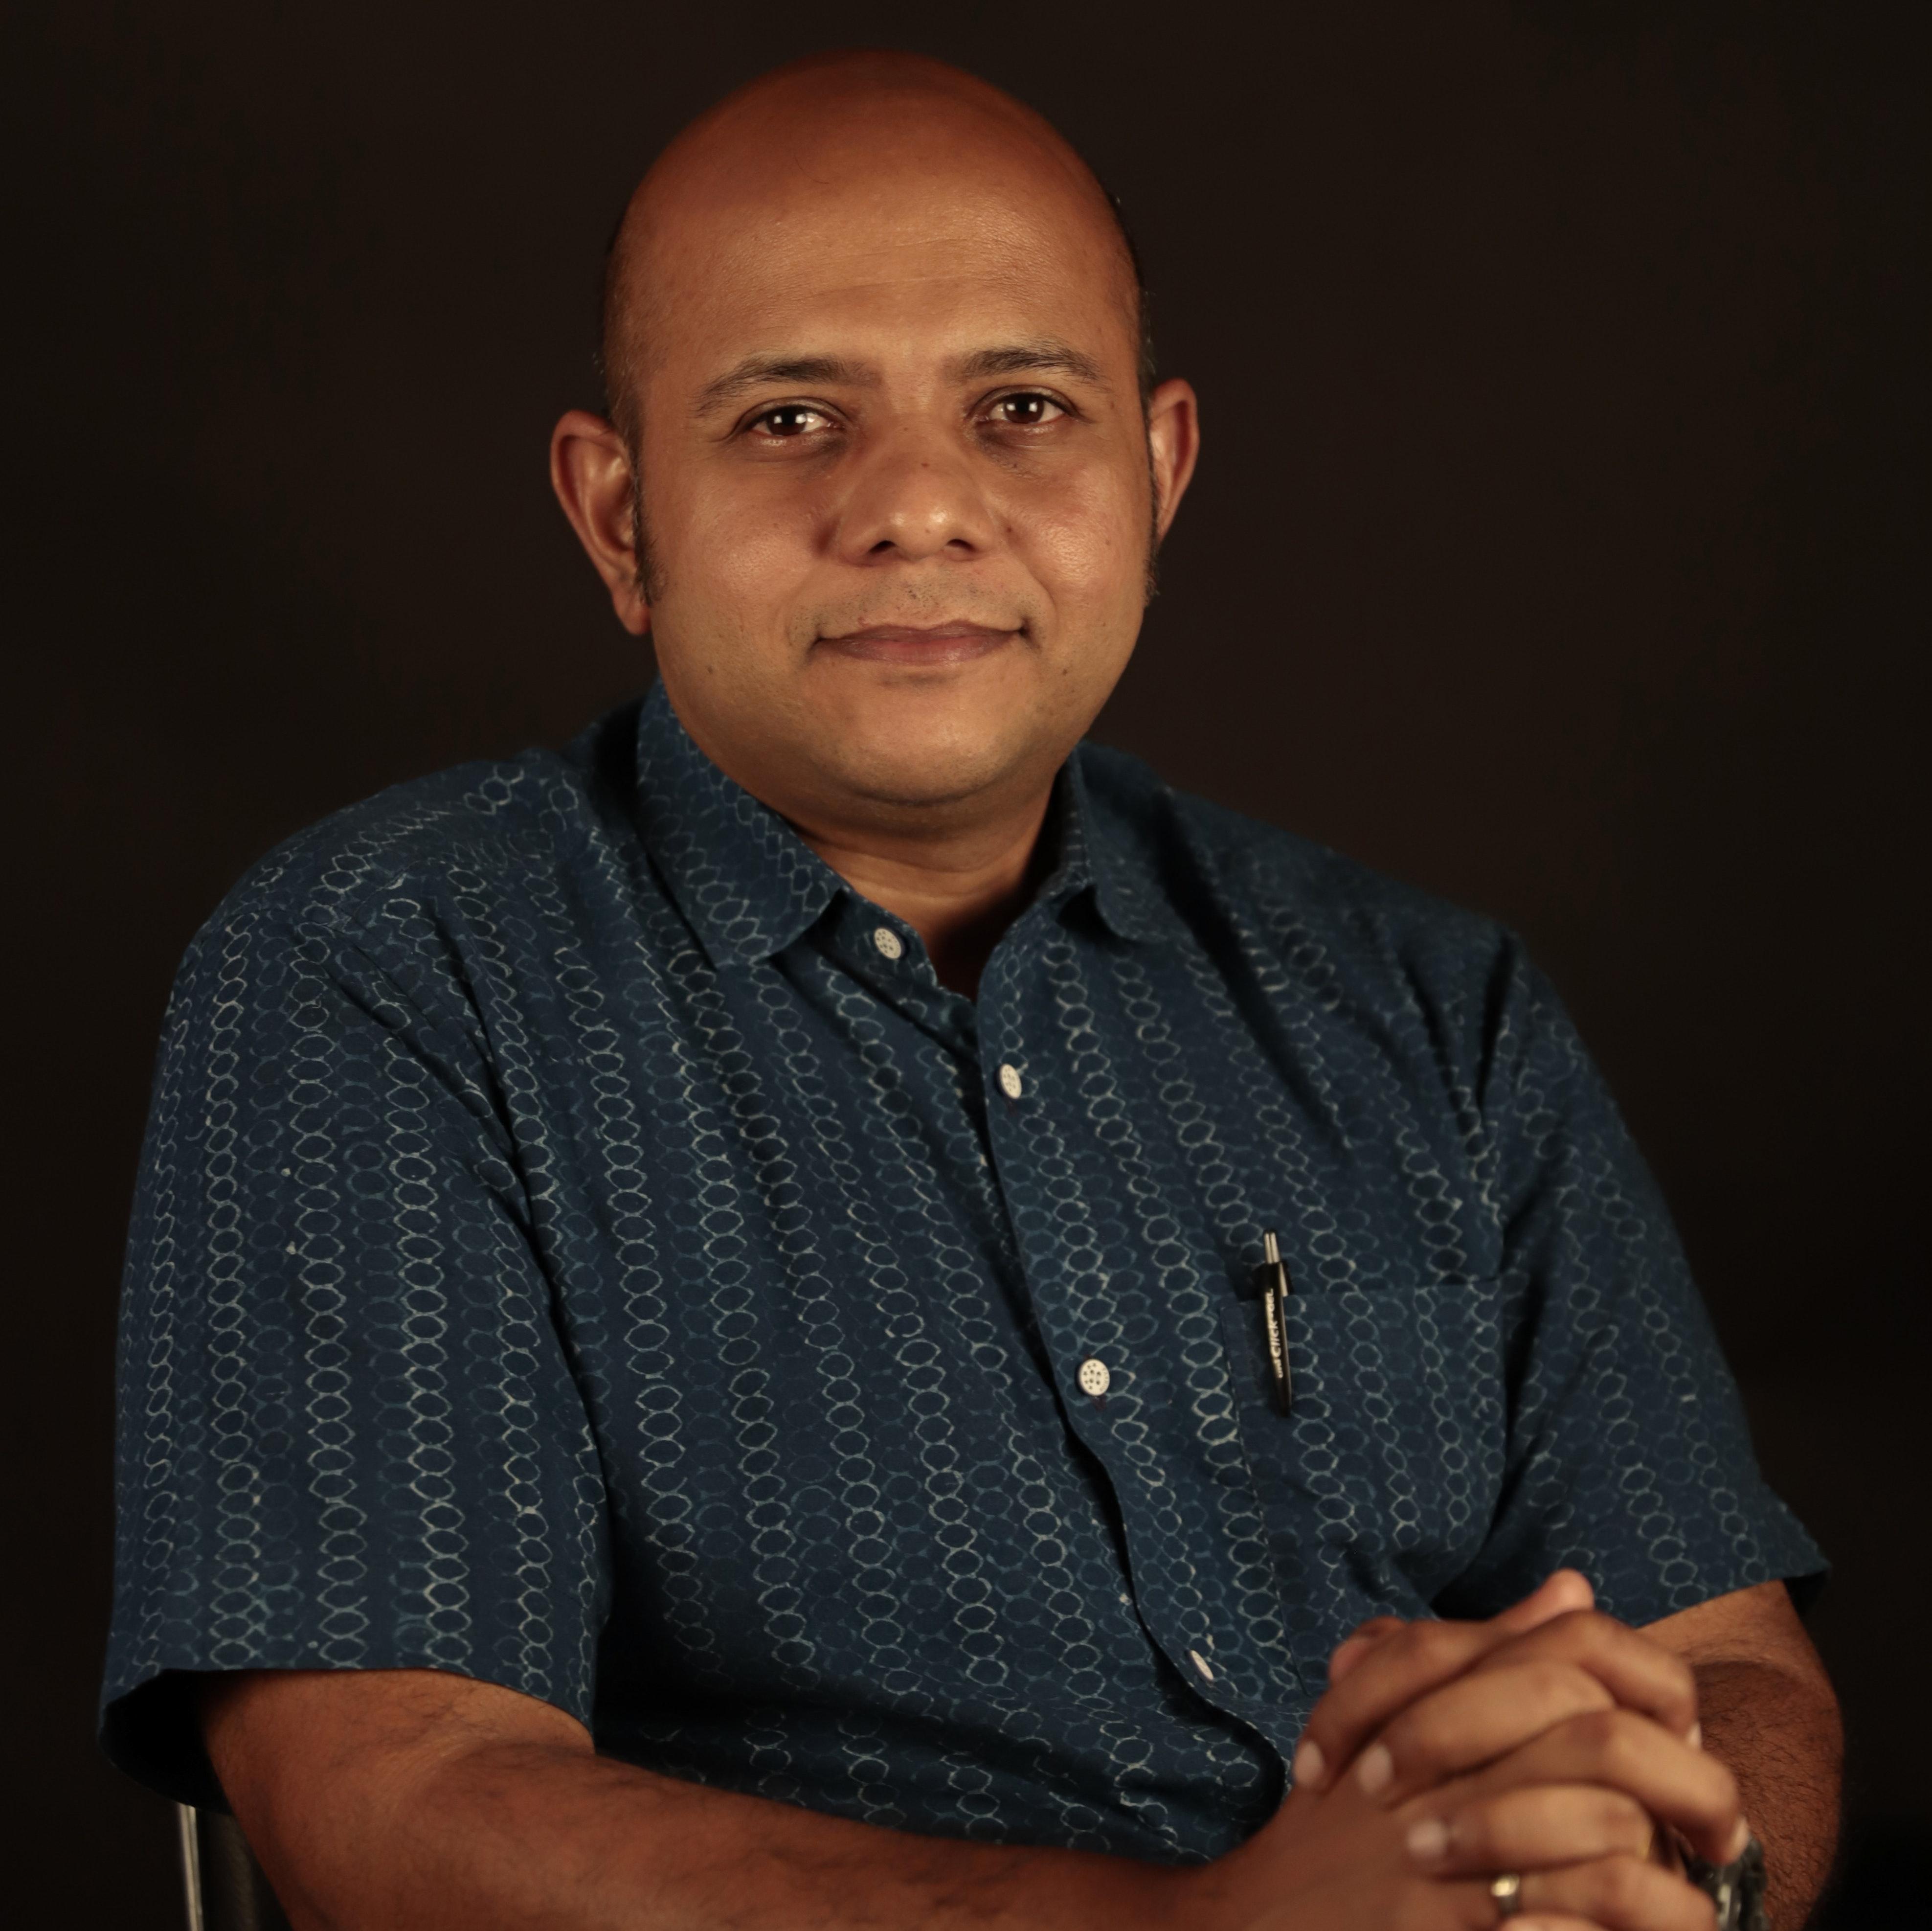 Portrait of Vinod Jose